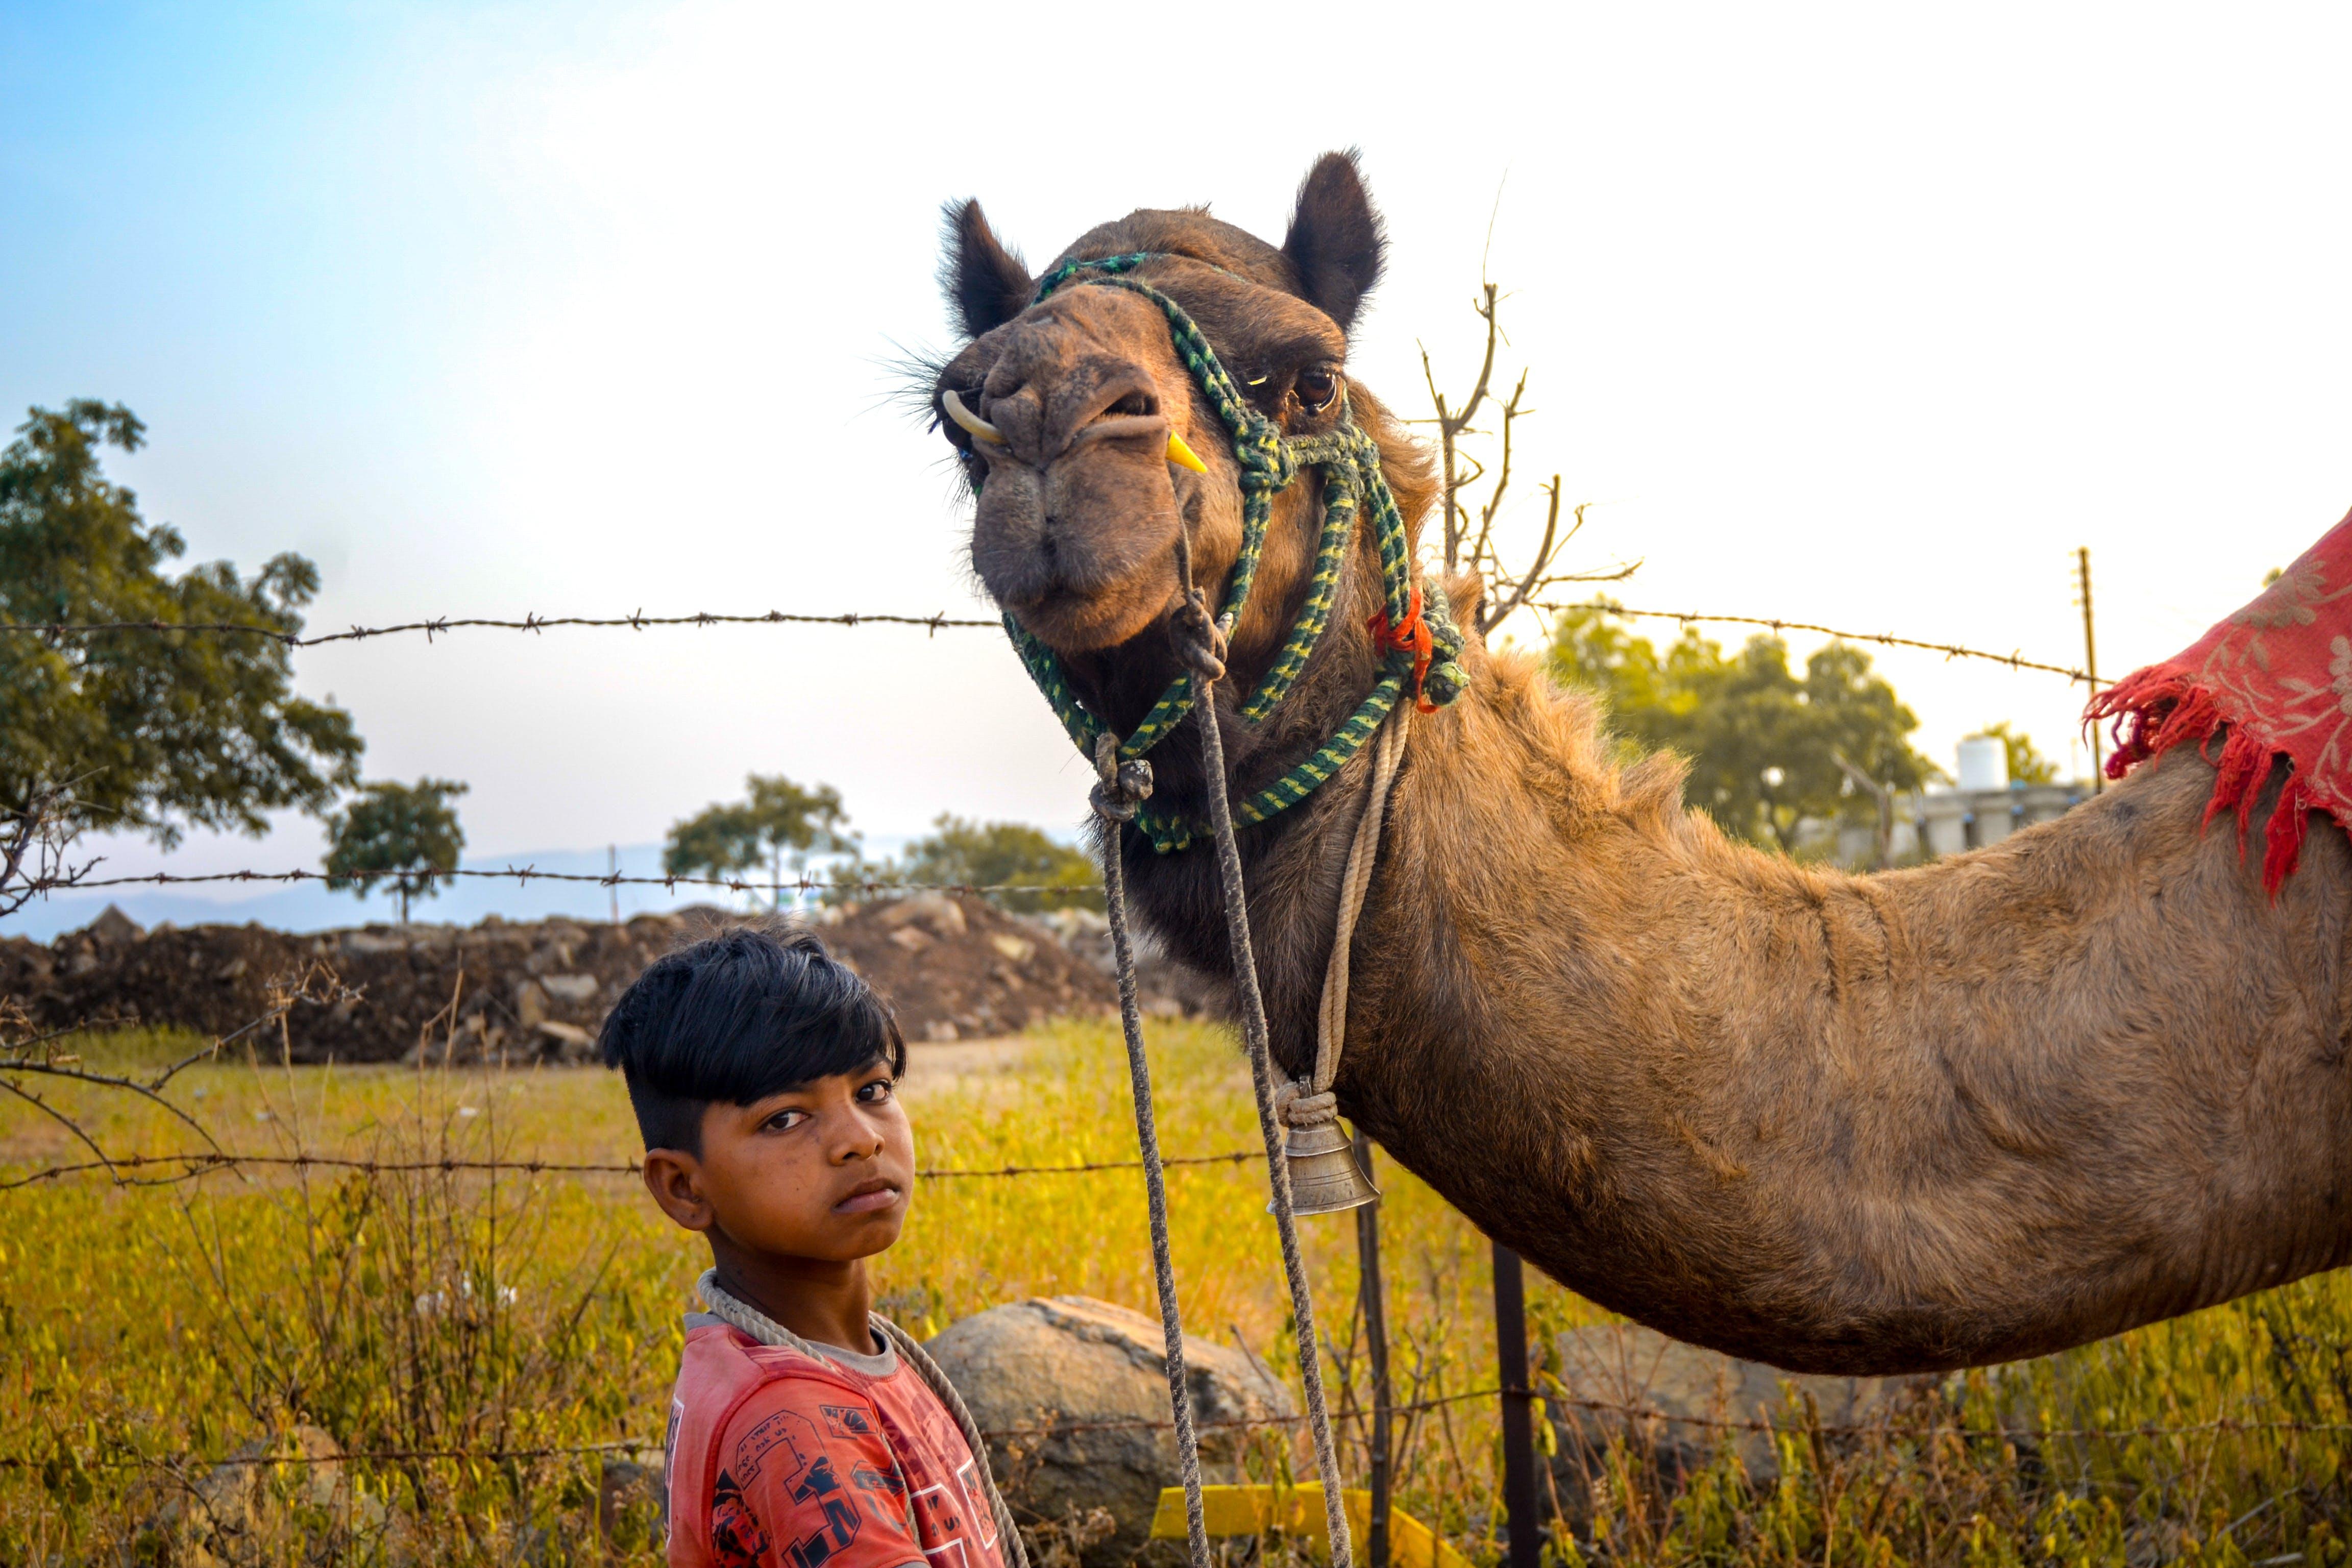 Kostnadsfri bild av arab, Arabisk kamel, arbetskraft, asiatisk pojke